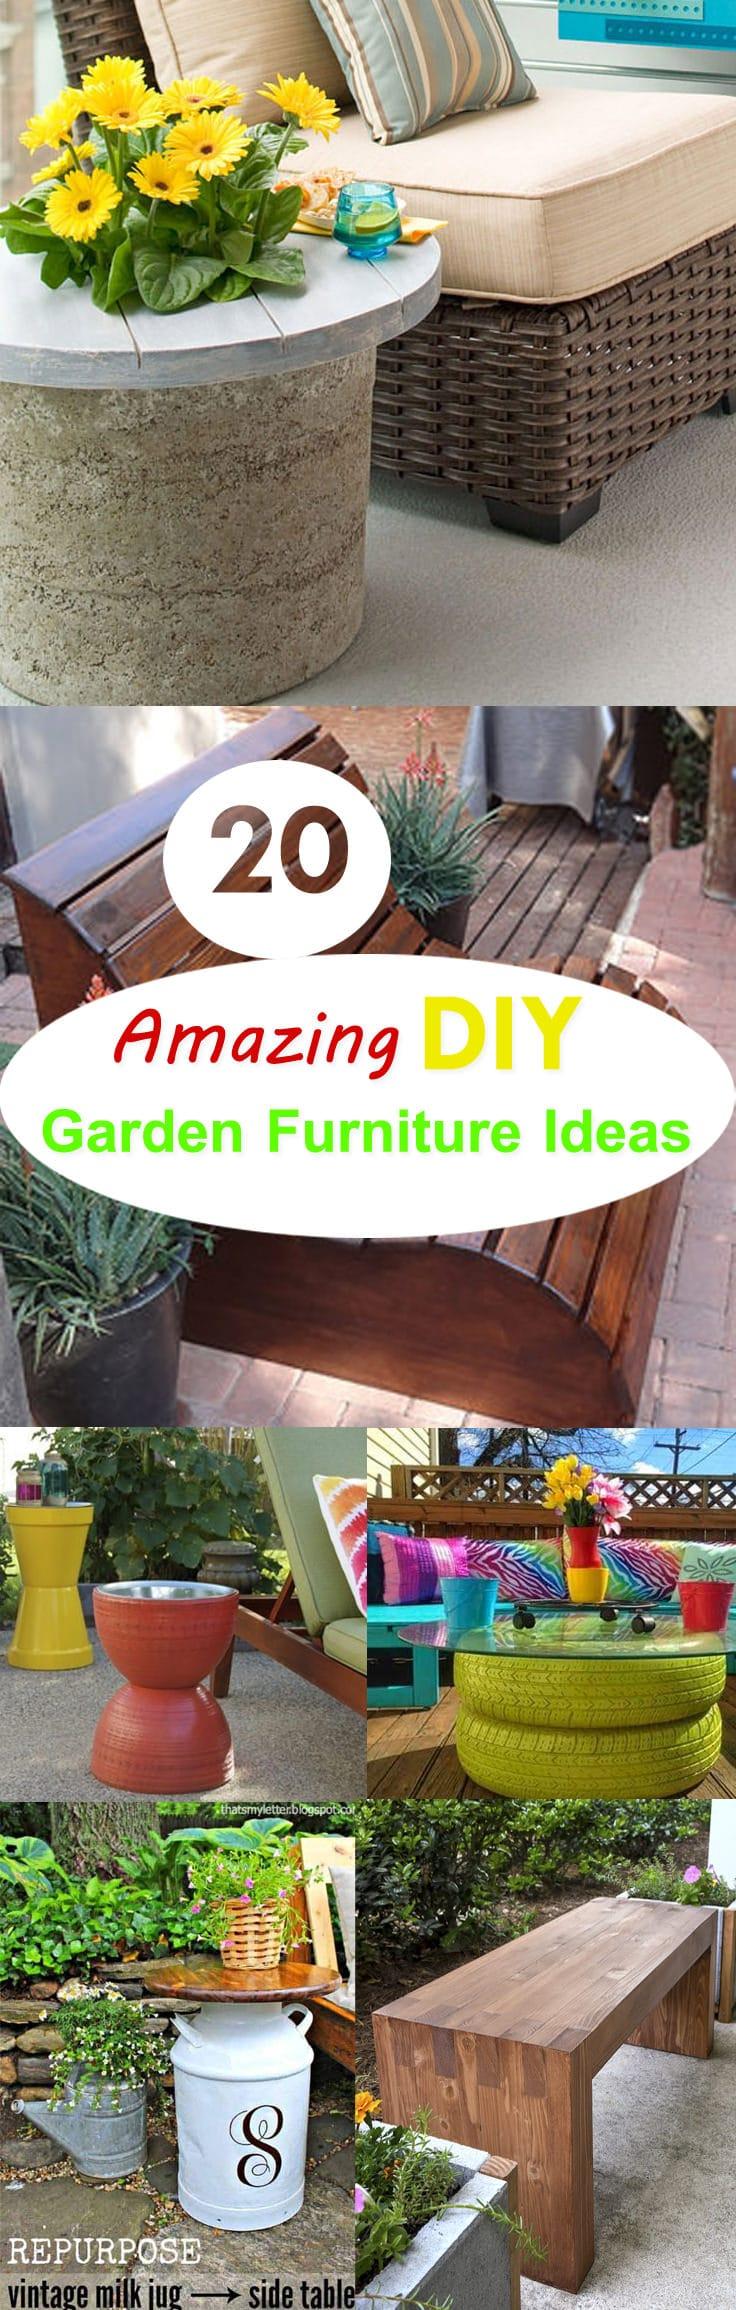 20 Amazing DIY Garden Furniture Ideas | DIY Patio ... on Diy Garden Patio Ideas id=25192